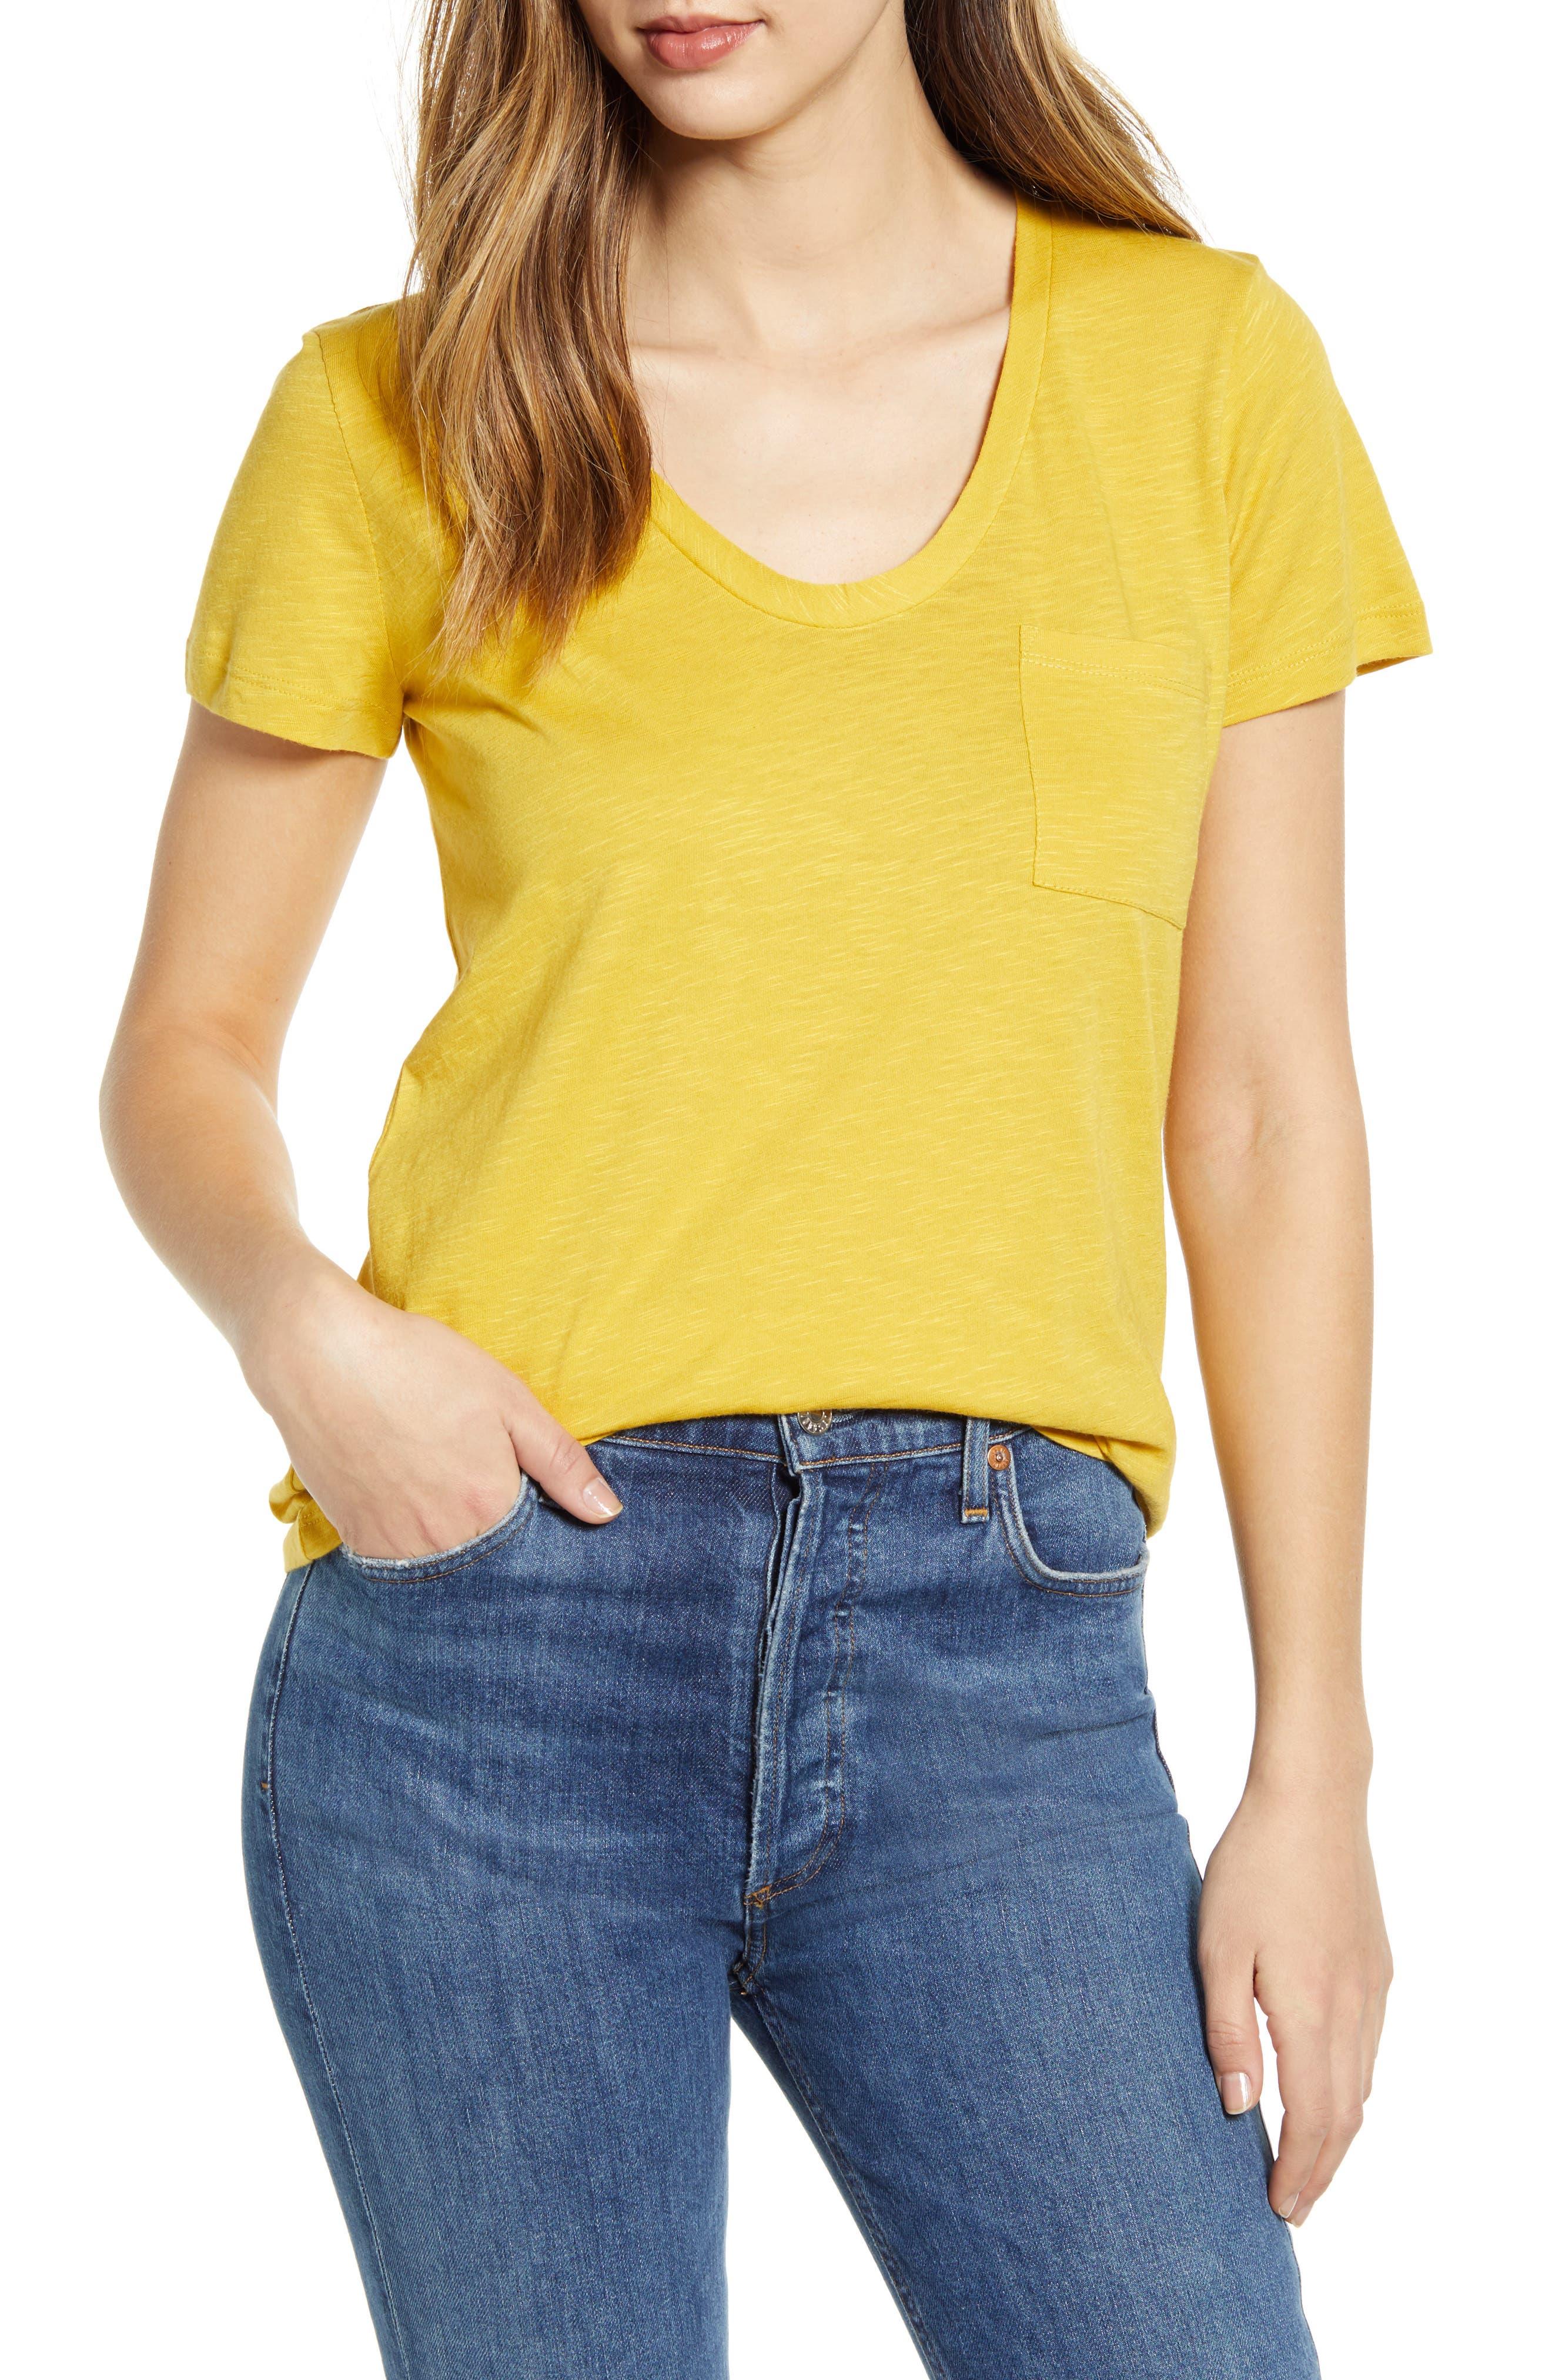 Designer Top T-Shirt Women/'s Blouse Yellow Heavy Detail Halter Neck Top